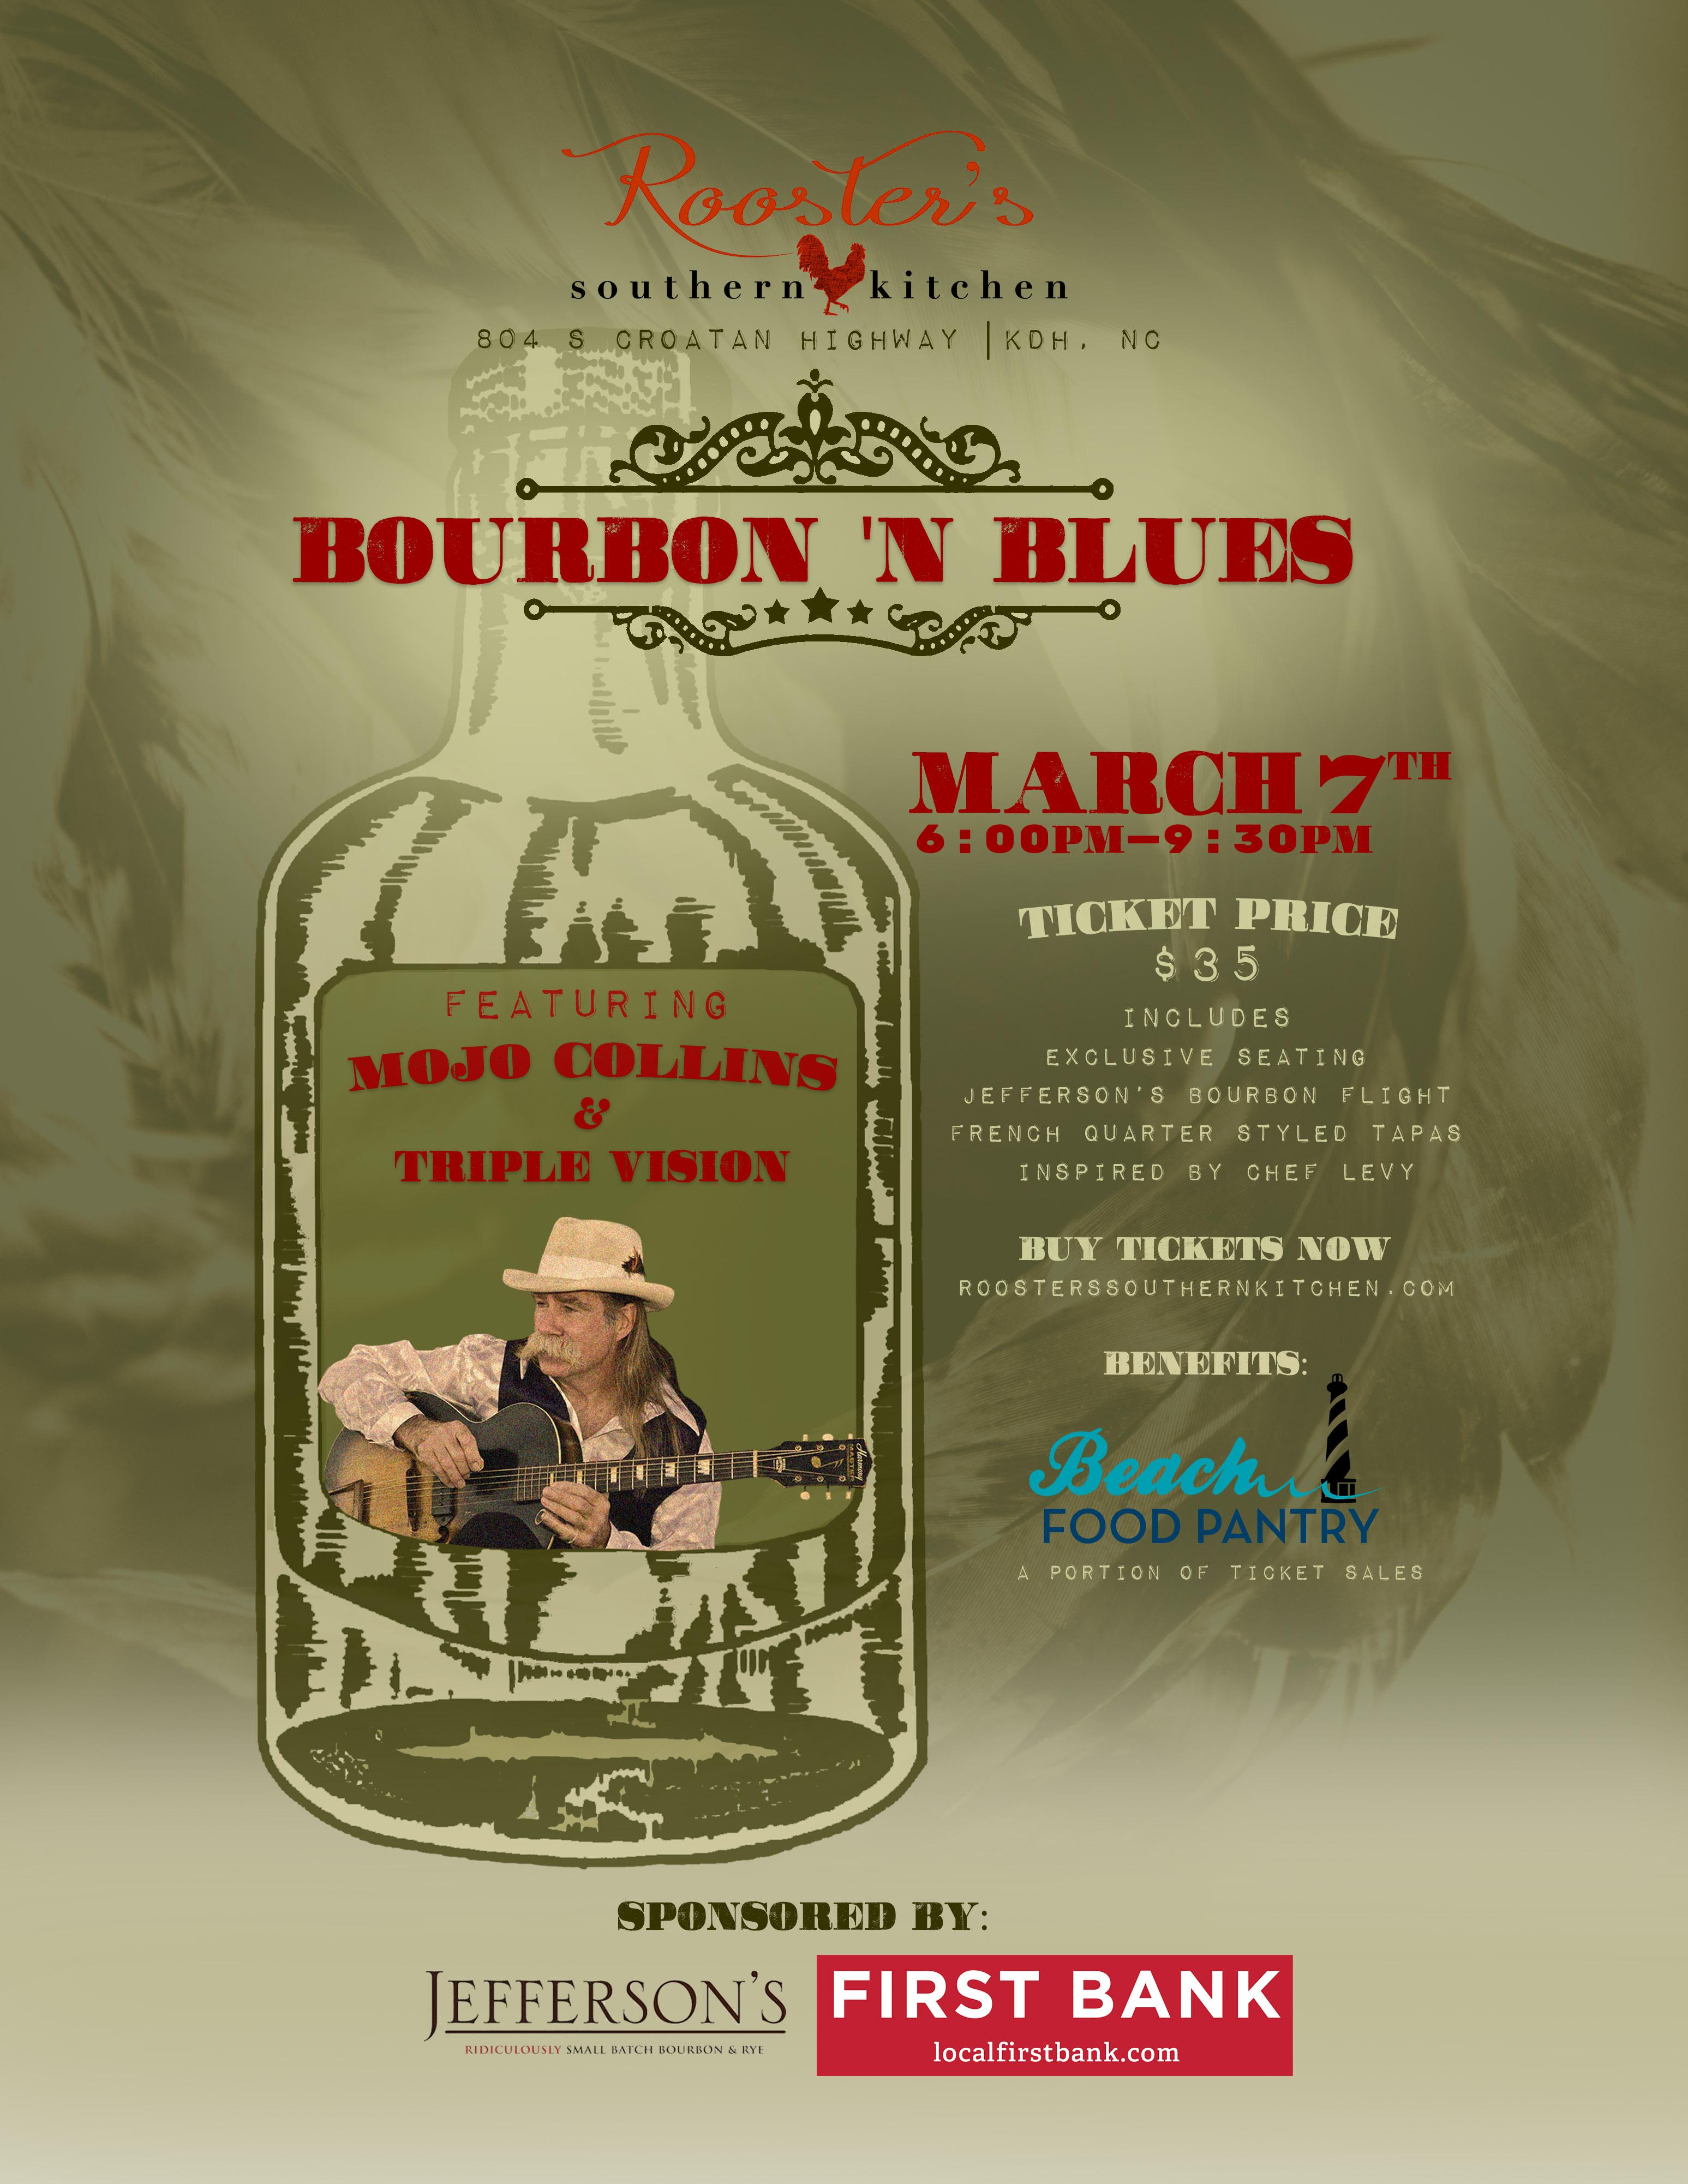 Bourbon N' Blues featuring Mojo Collins & Triple Vision